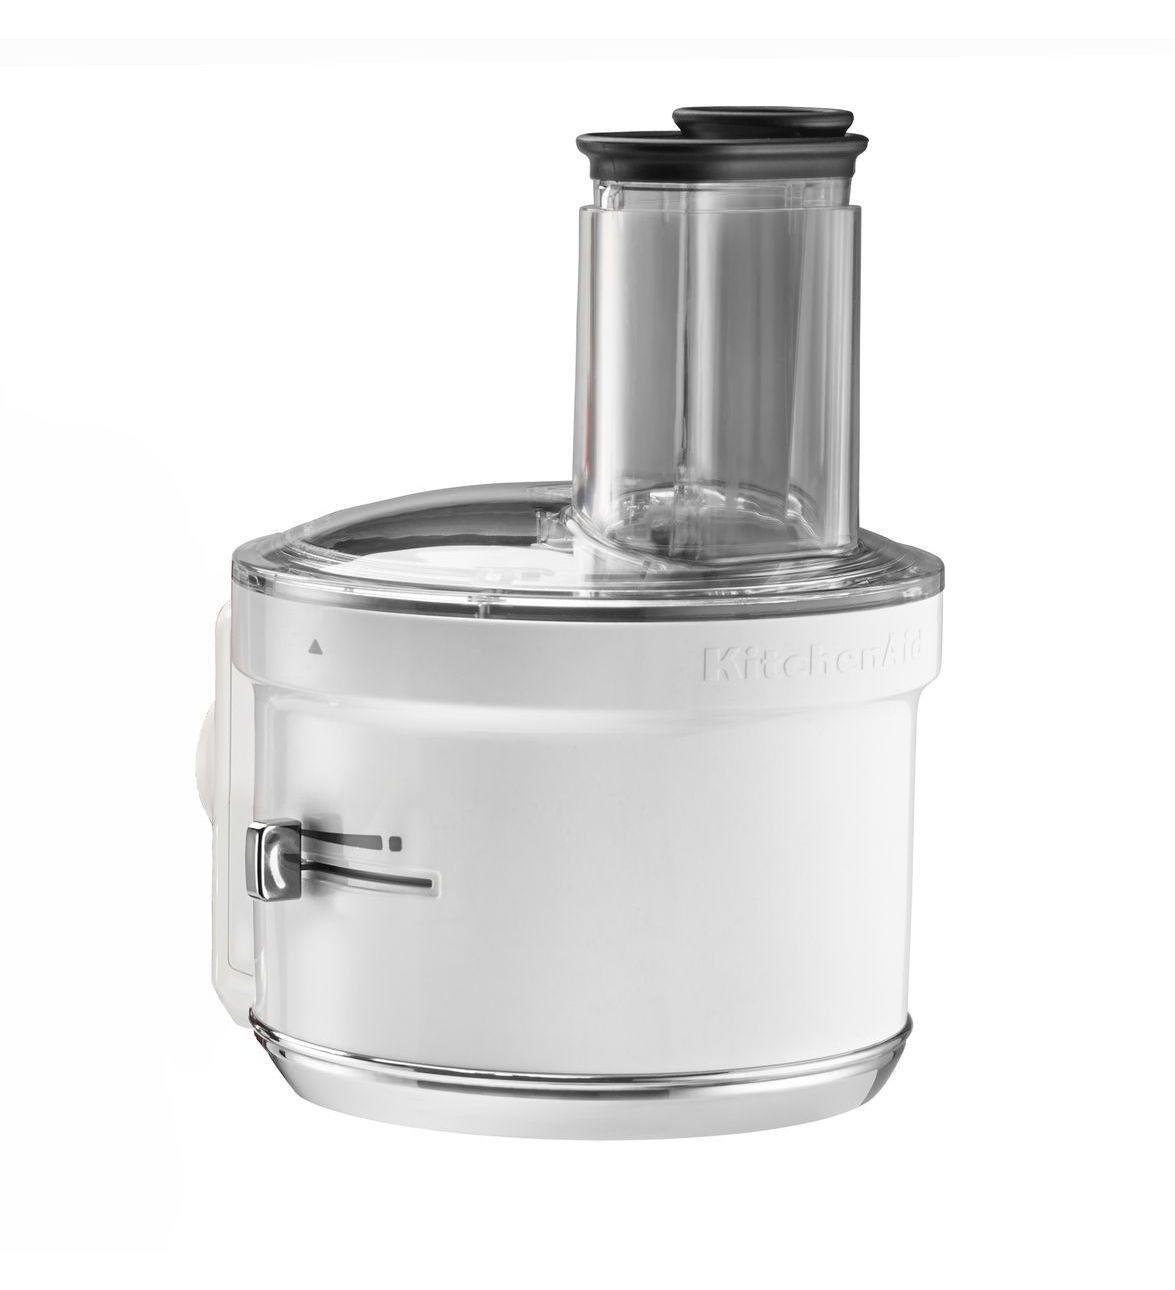 Kitchenaid food processor attachment ksm1fpa with